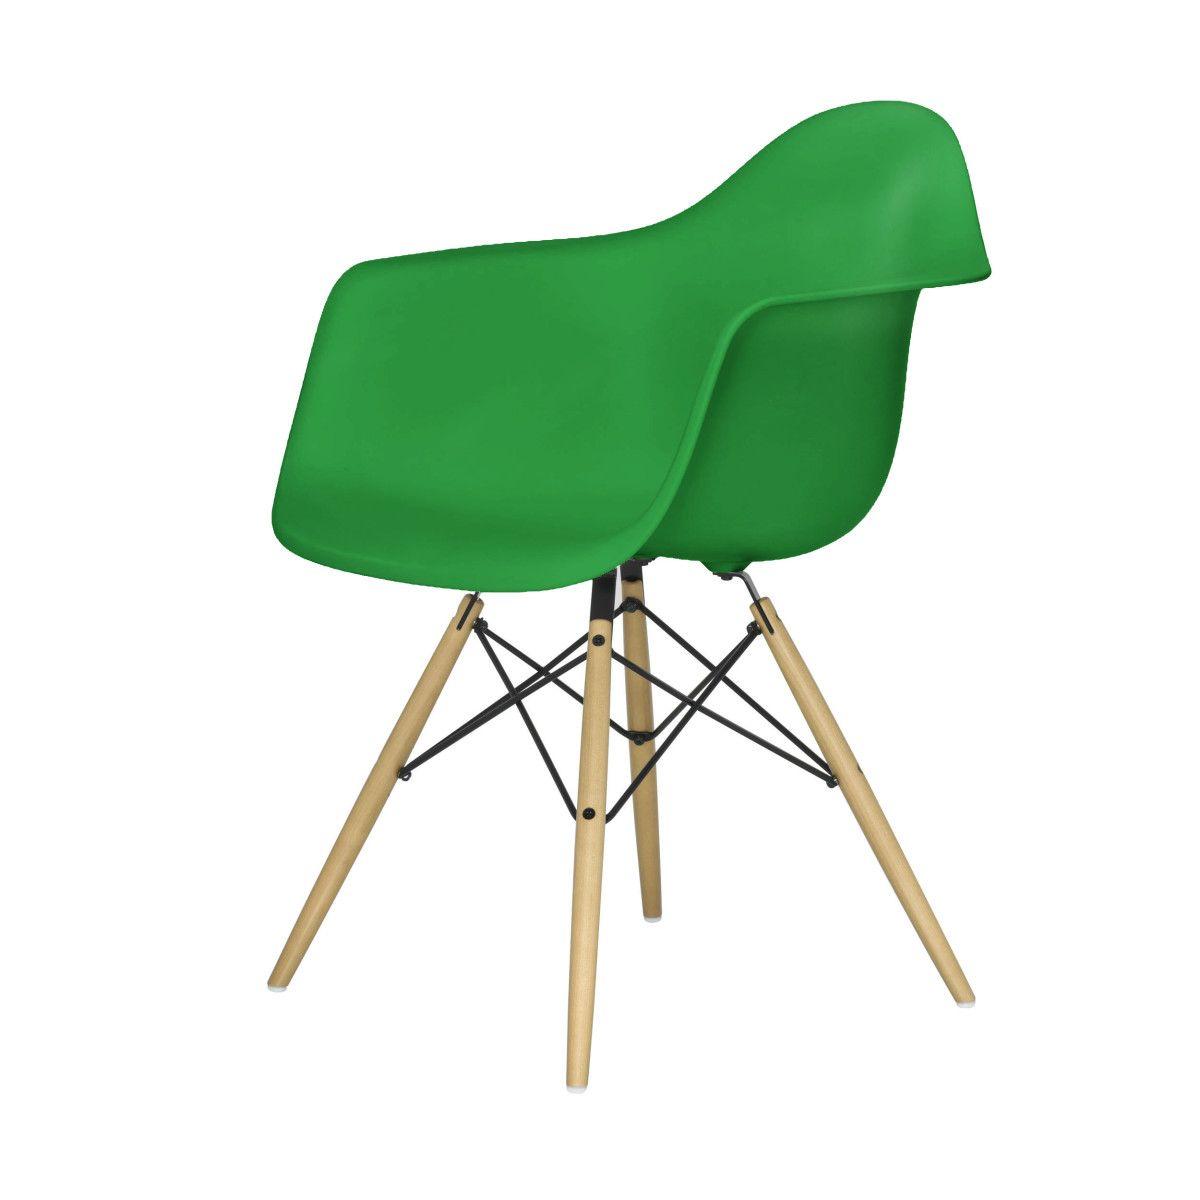 Eames Plastic Armchair Stuhl DAW mit Filzgleitern classic